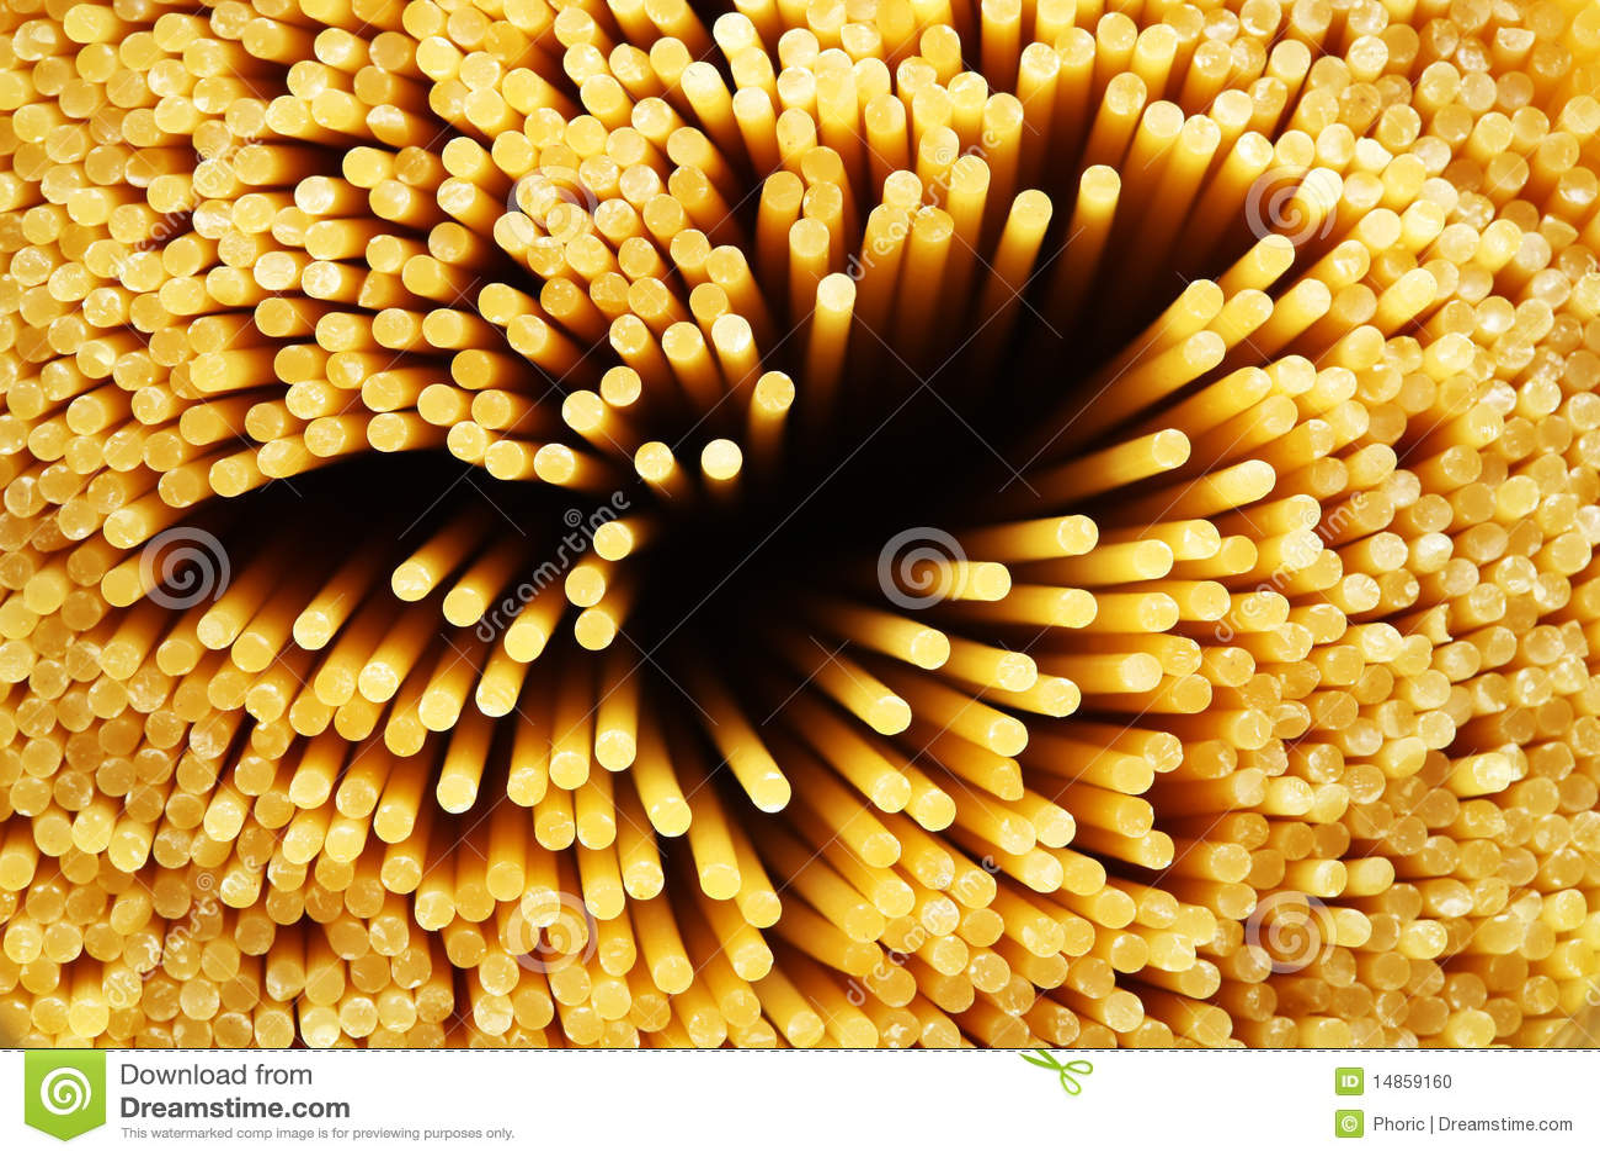 Raw spaghetti noddles closeup